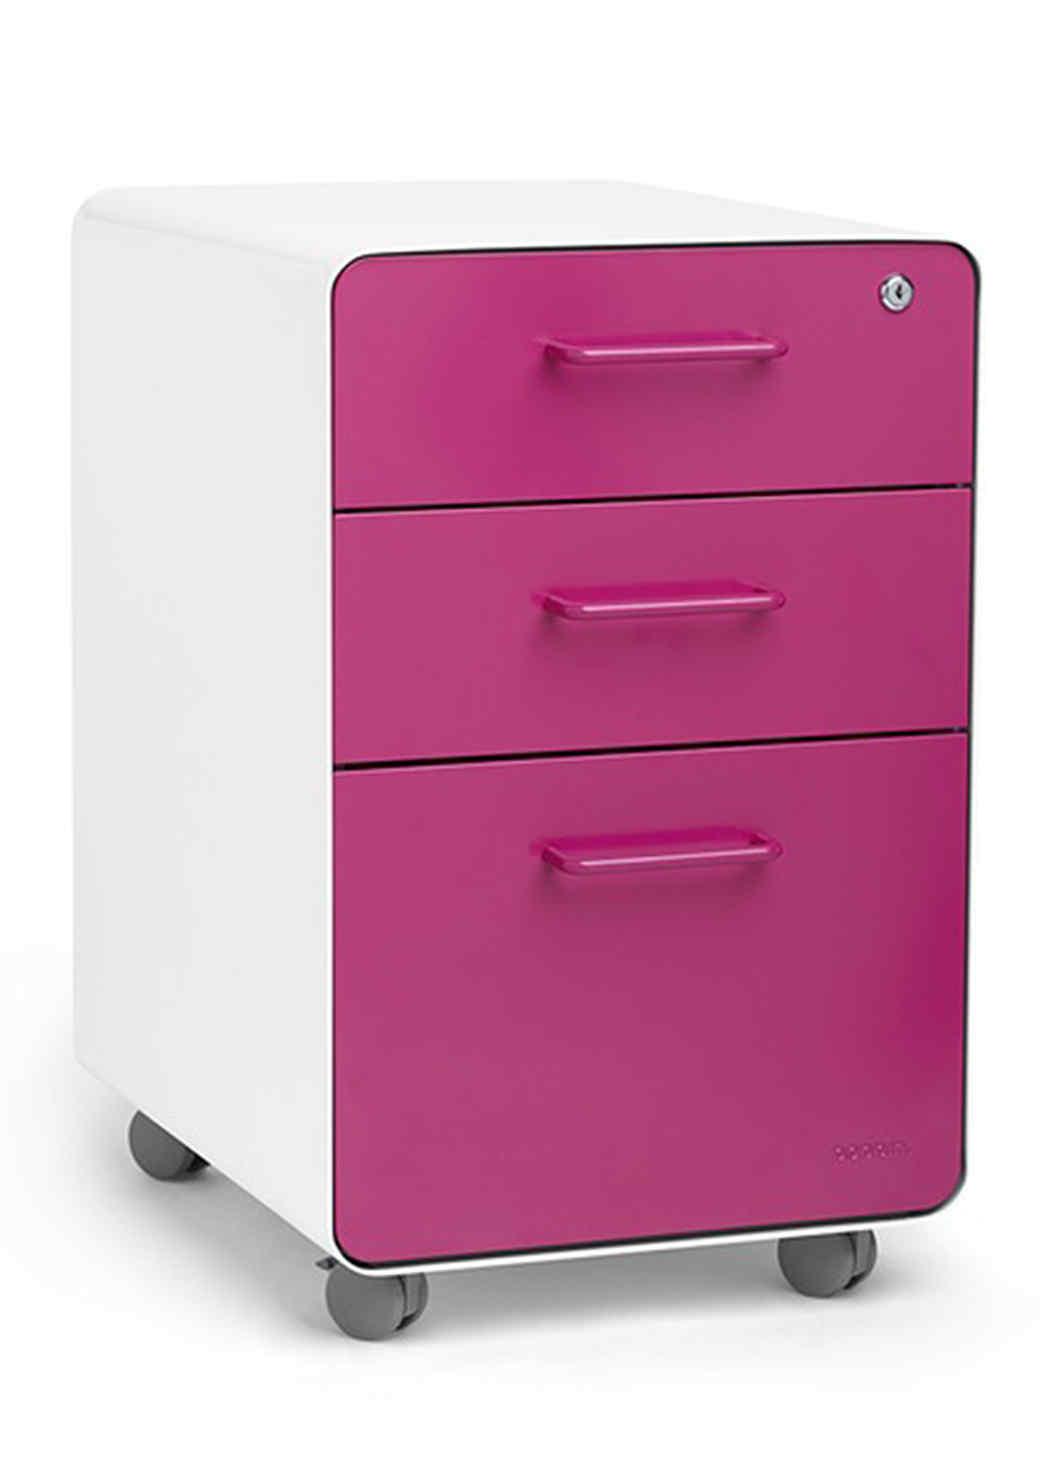 pink-rolling-file-cabinet-0116.jpg (skyword:224747)